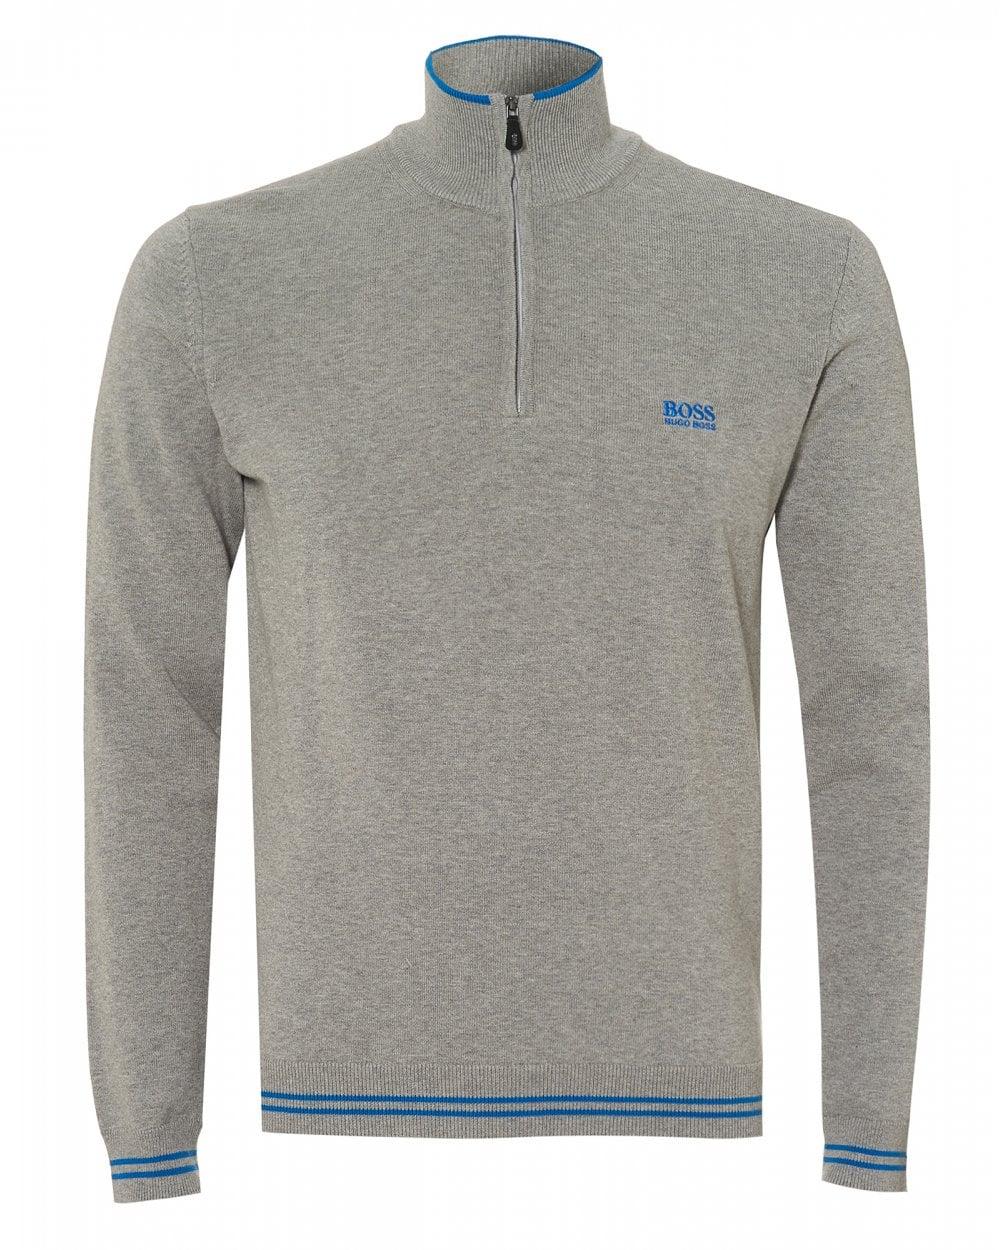 ad810e71d BOSS Athleisure Mens Zimex_W18 Jumper, Quarter Zip Grey Melange Sweater